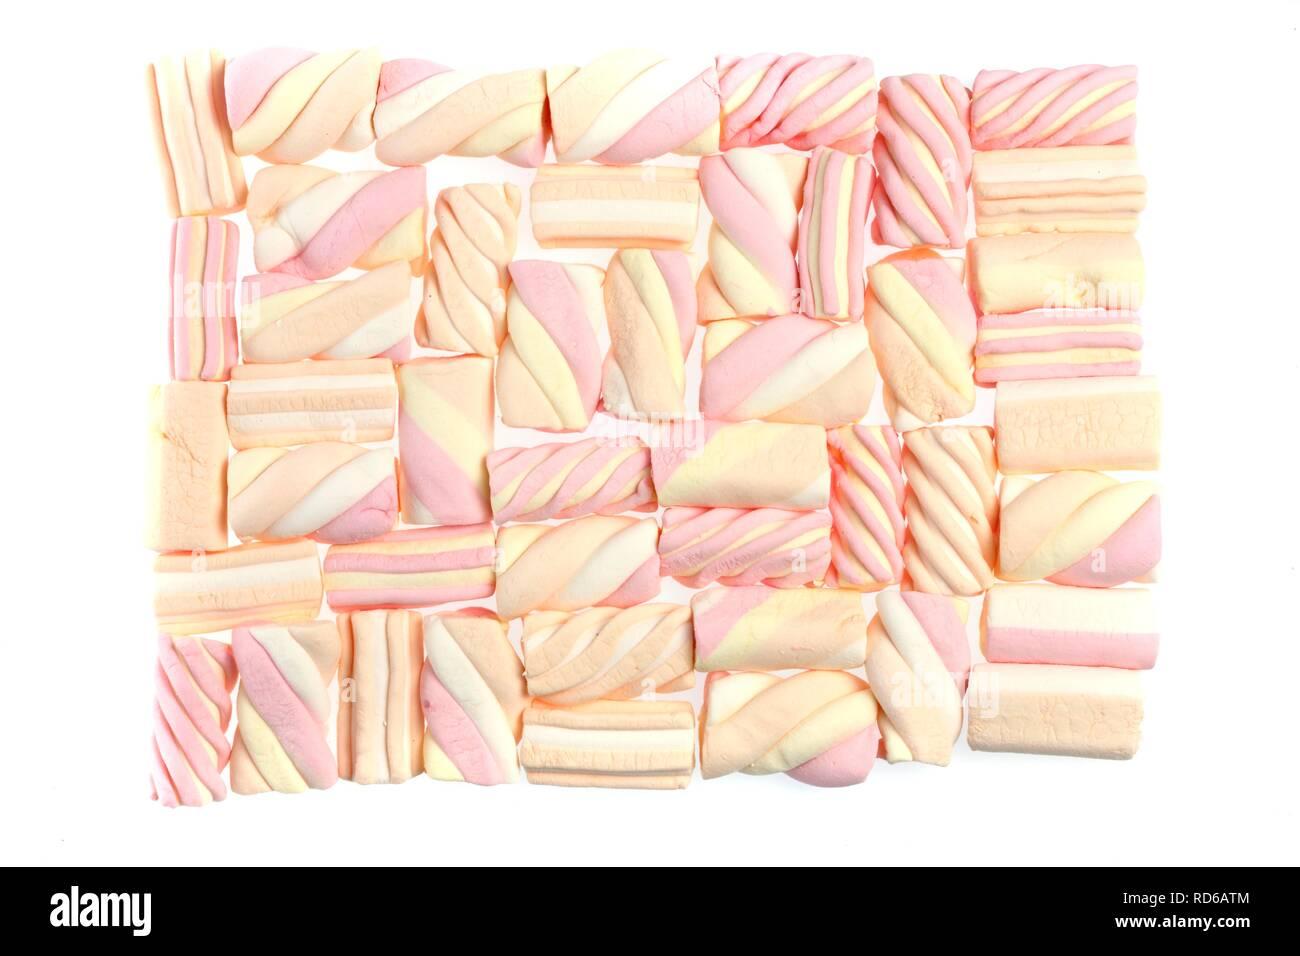 Marshmallows - Stock Image